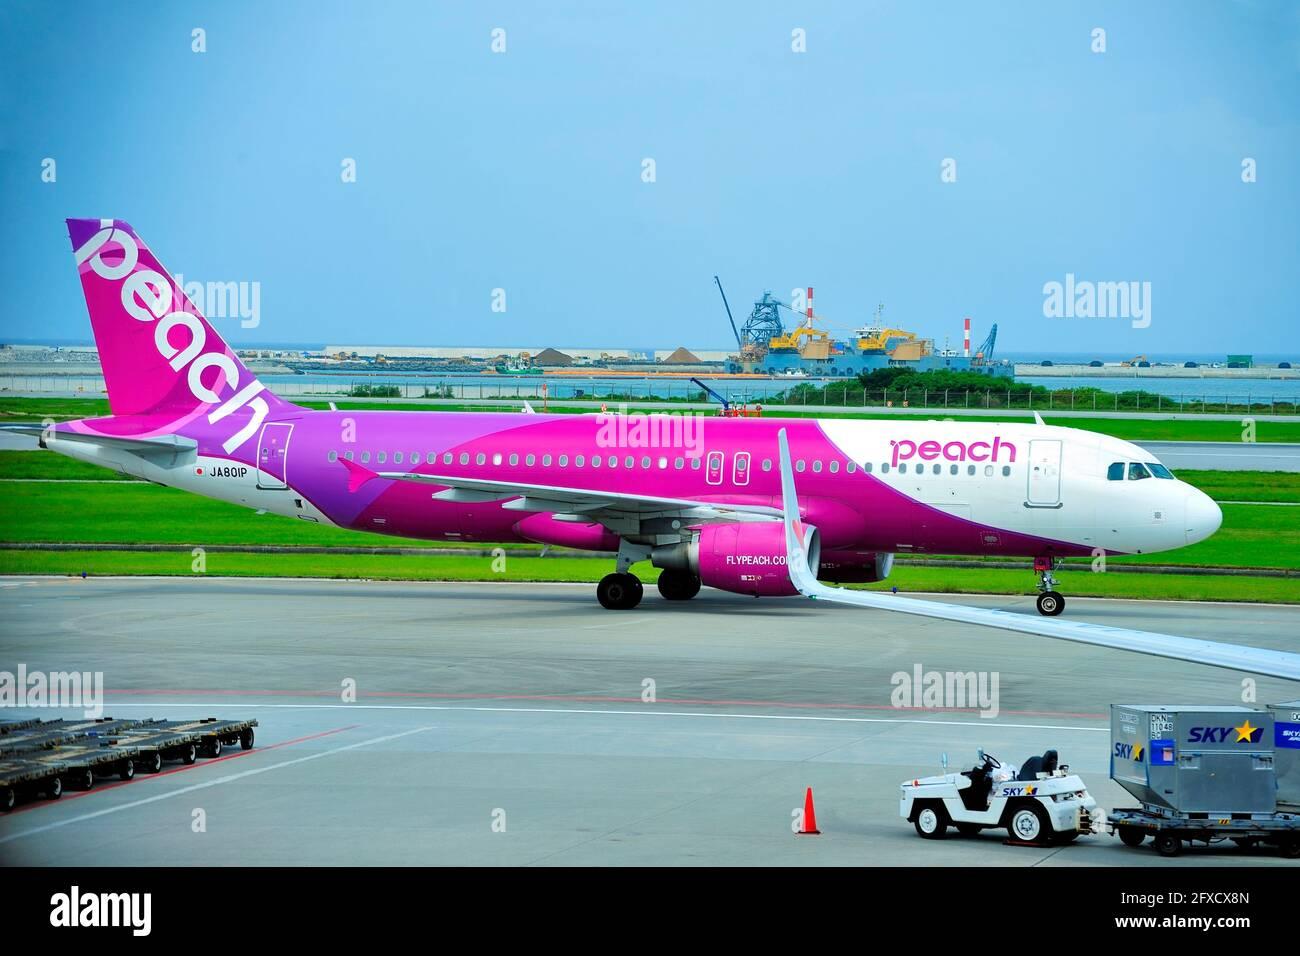 Peach, Airbus A320, JA810P, Taxiing to TO, Naha Airport, Naha, Okinawa, Ryukyu Islands, Japan Stock Photo